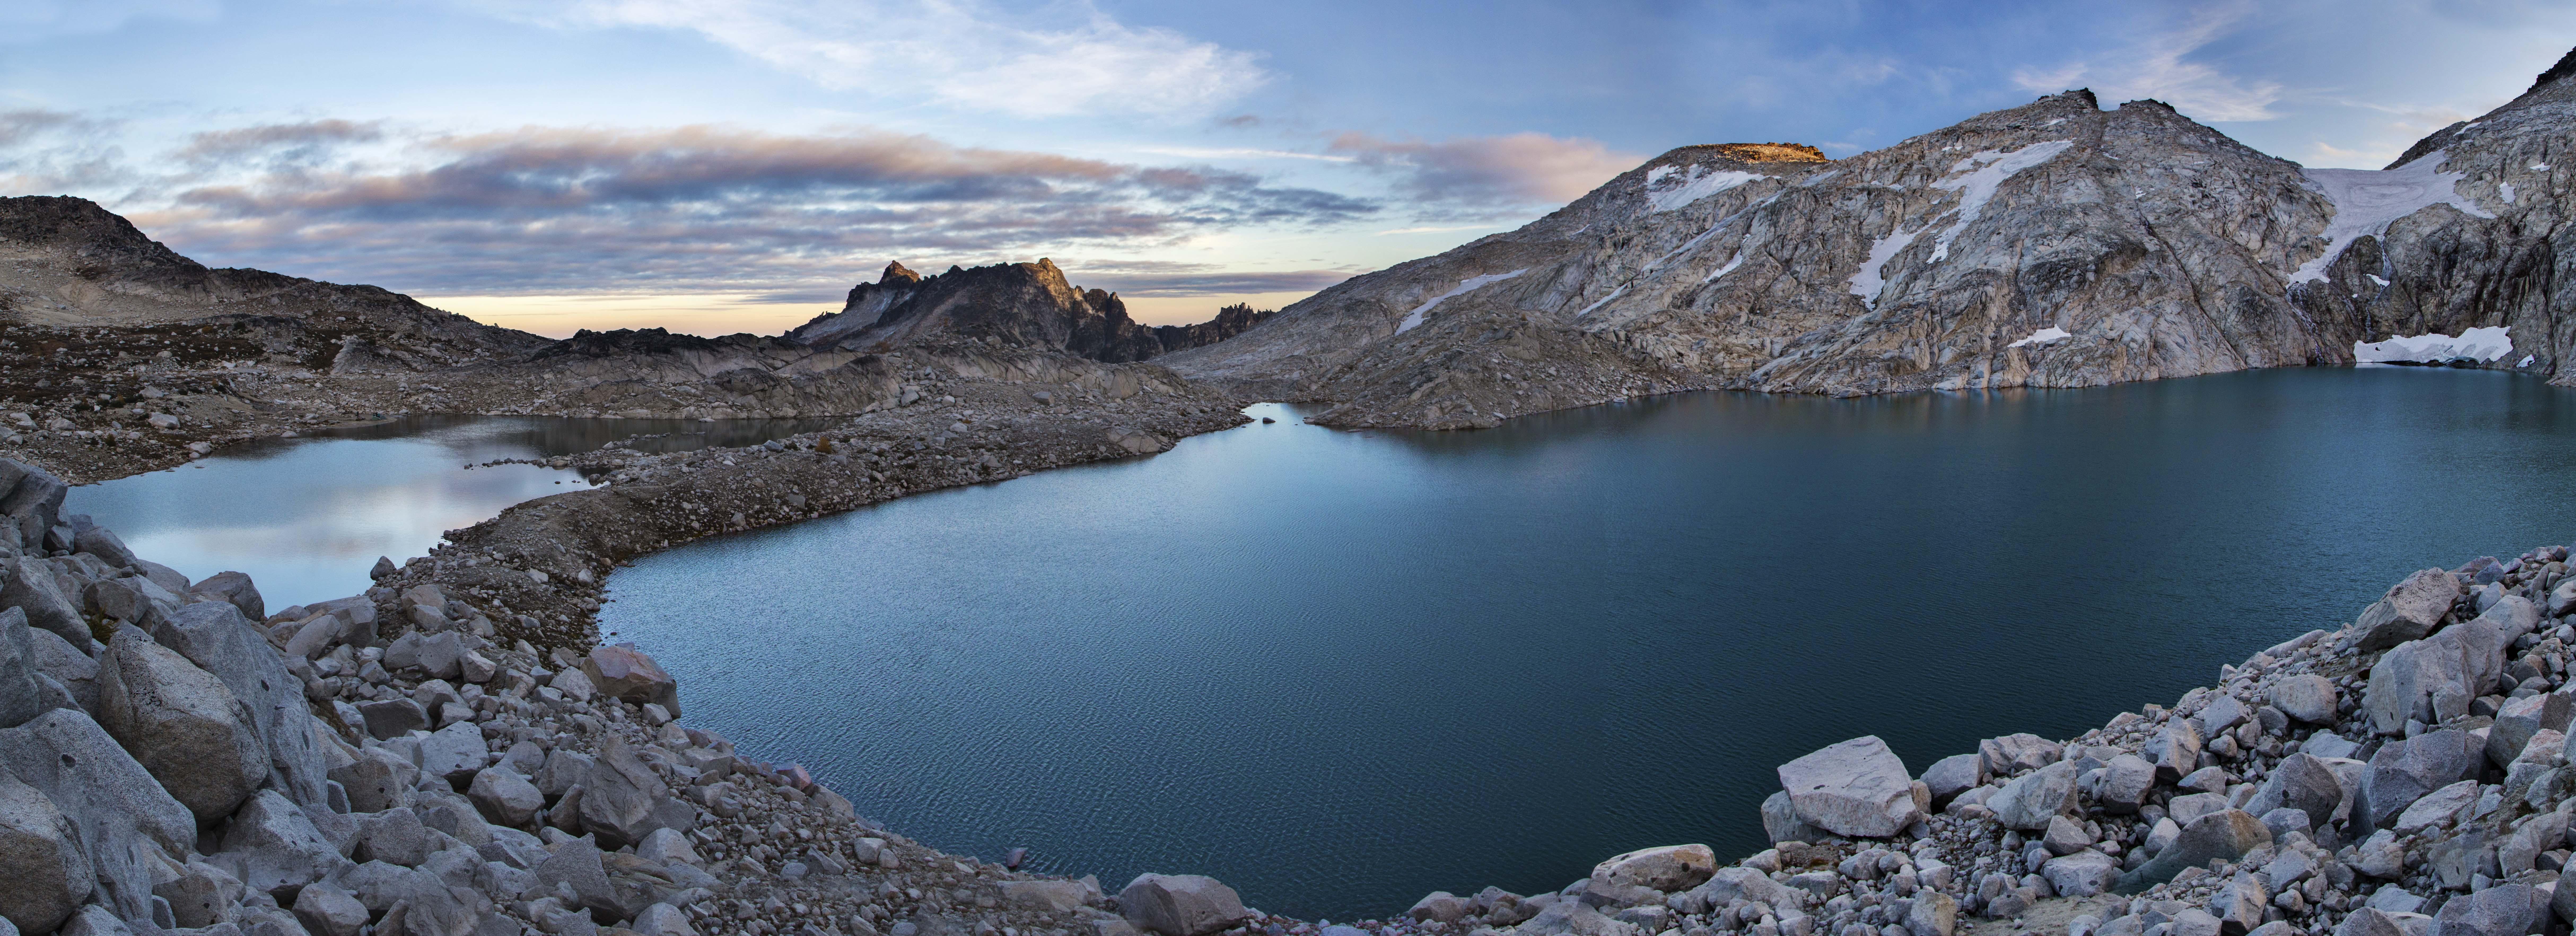 Little Annapurna, Enchantments, Alpine Lakes Wilderness, Washington скачать